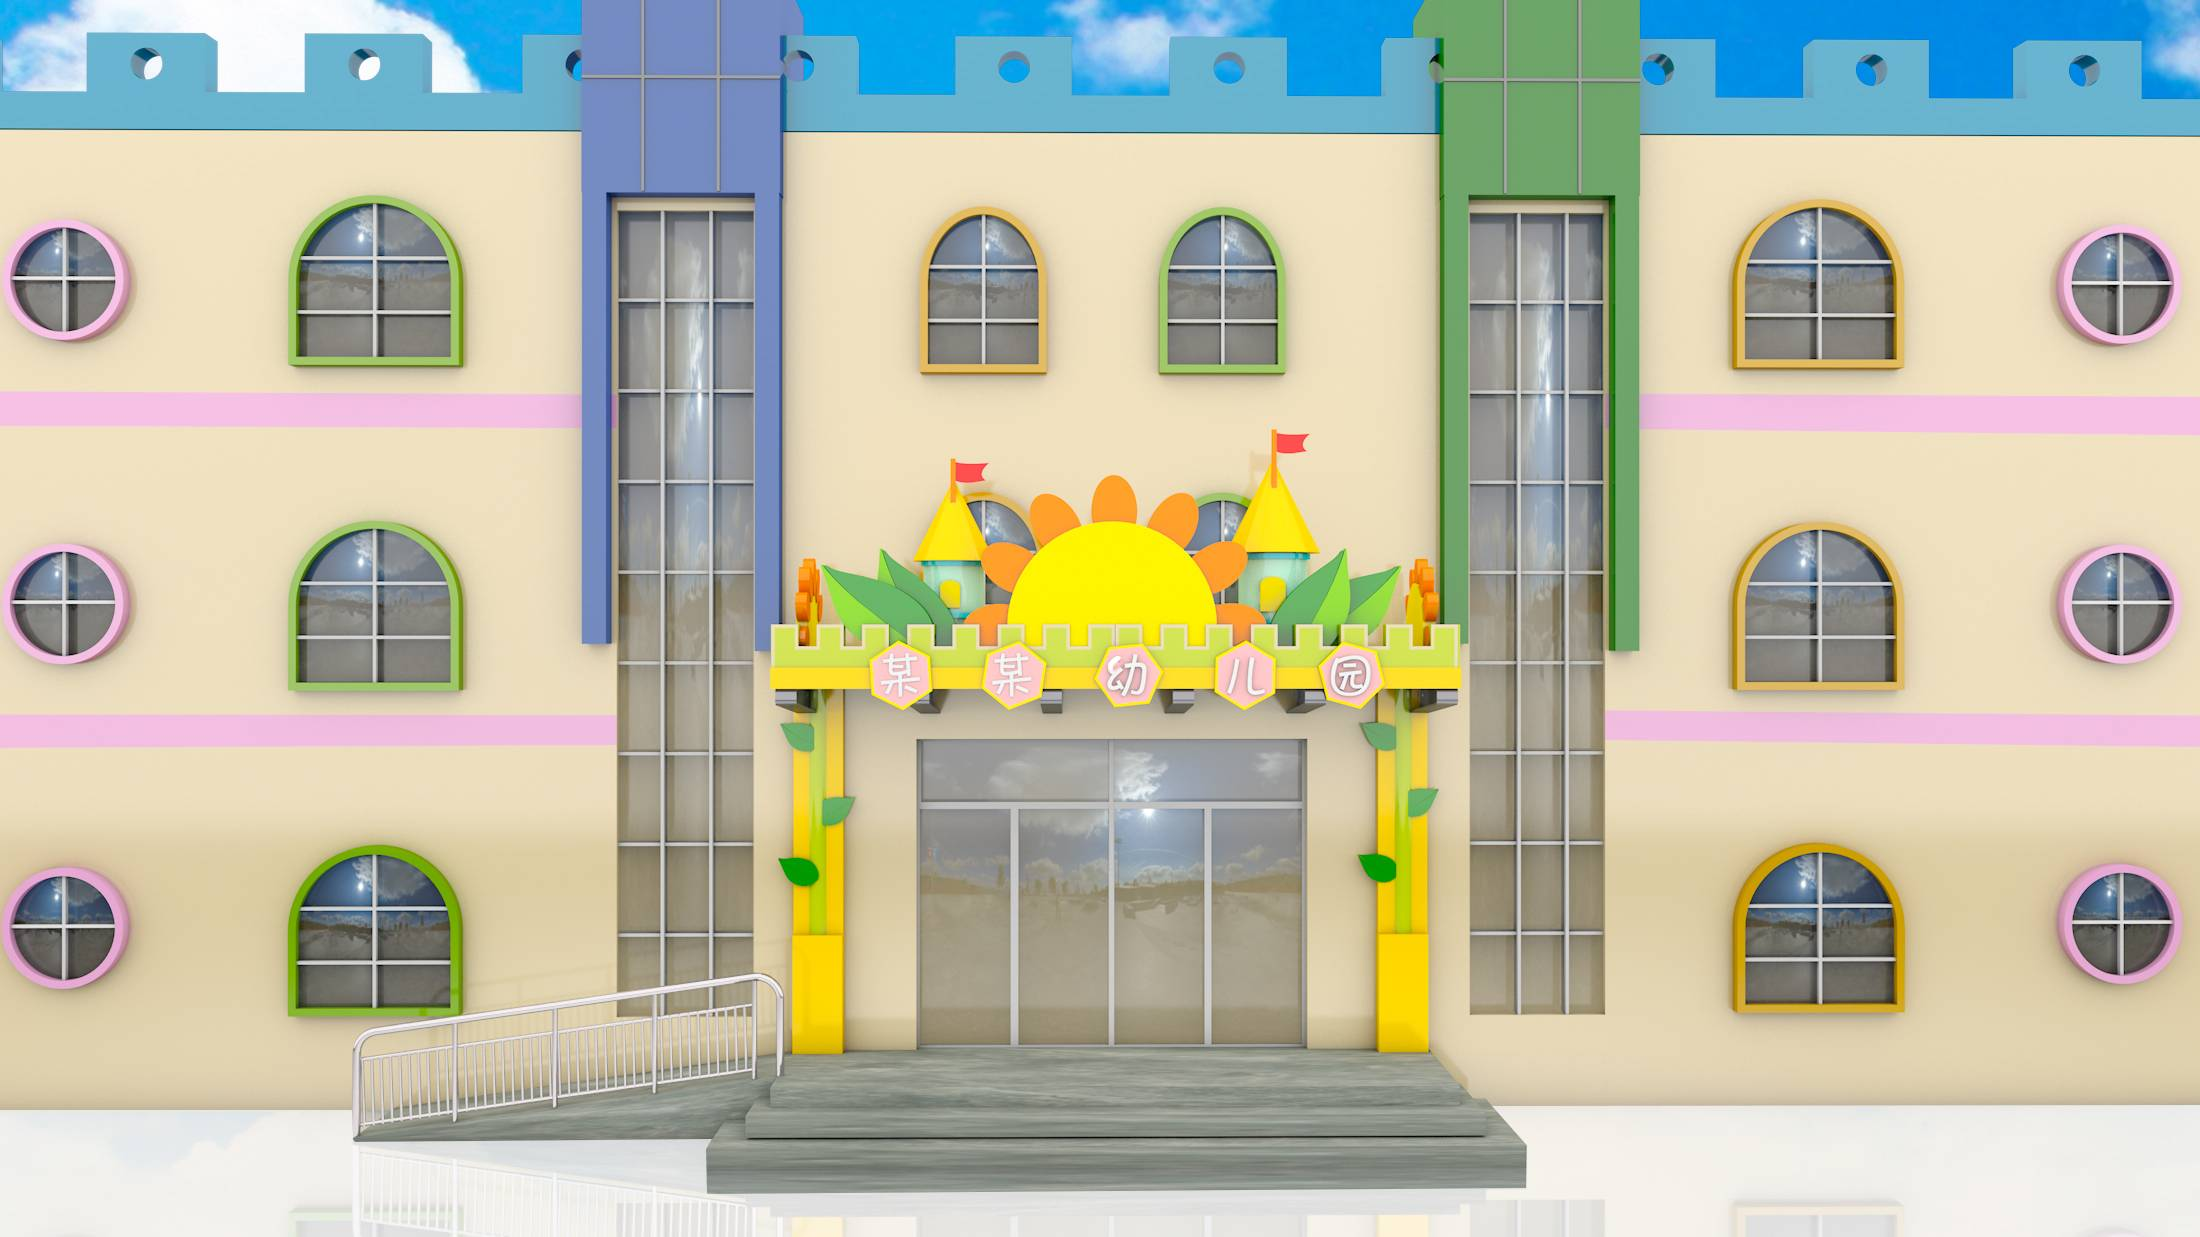 幼儿园设计,装饰设计,门头设计